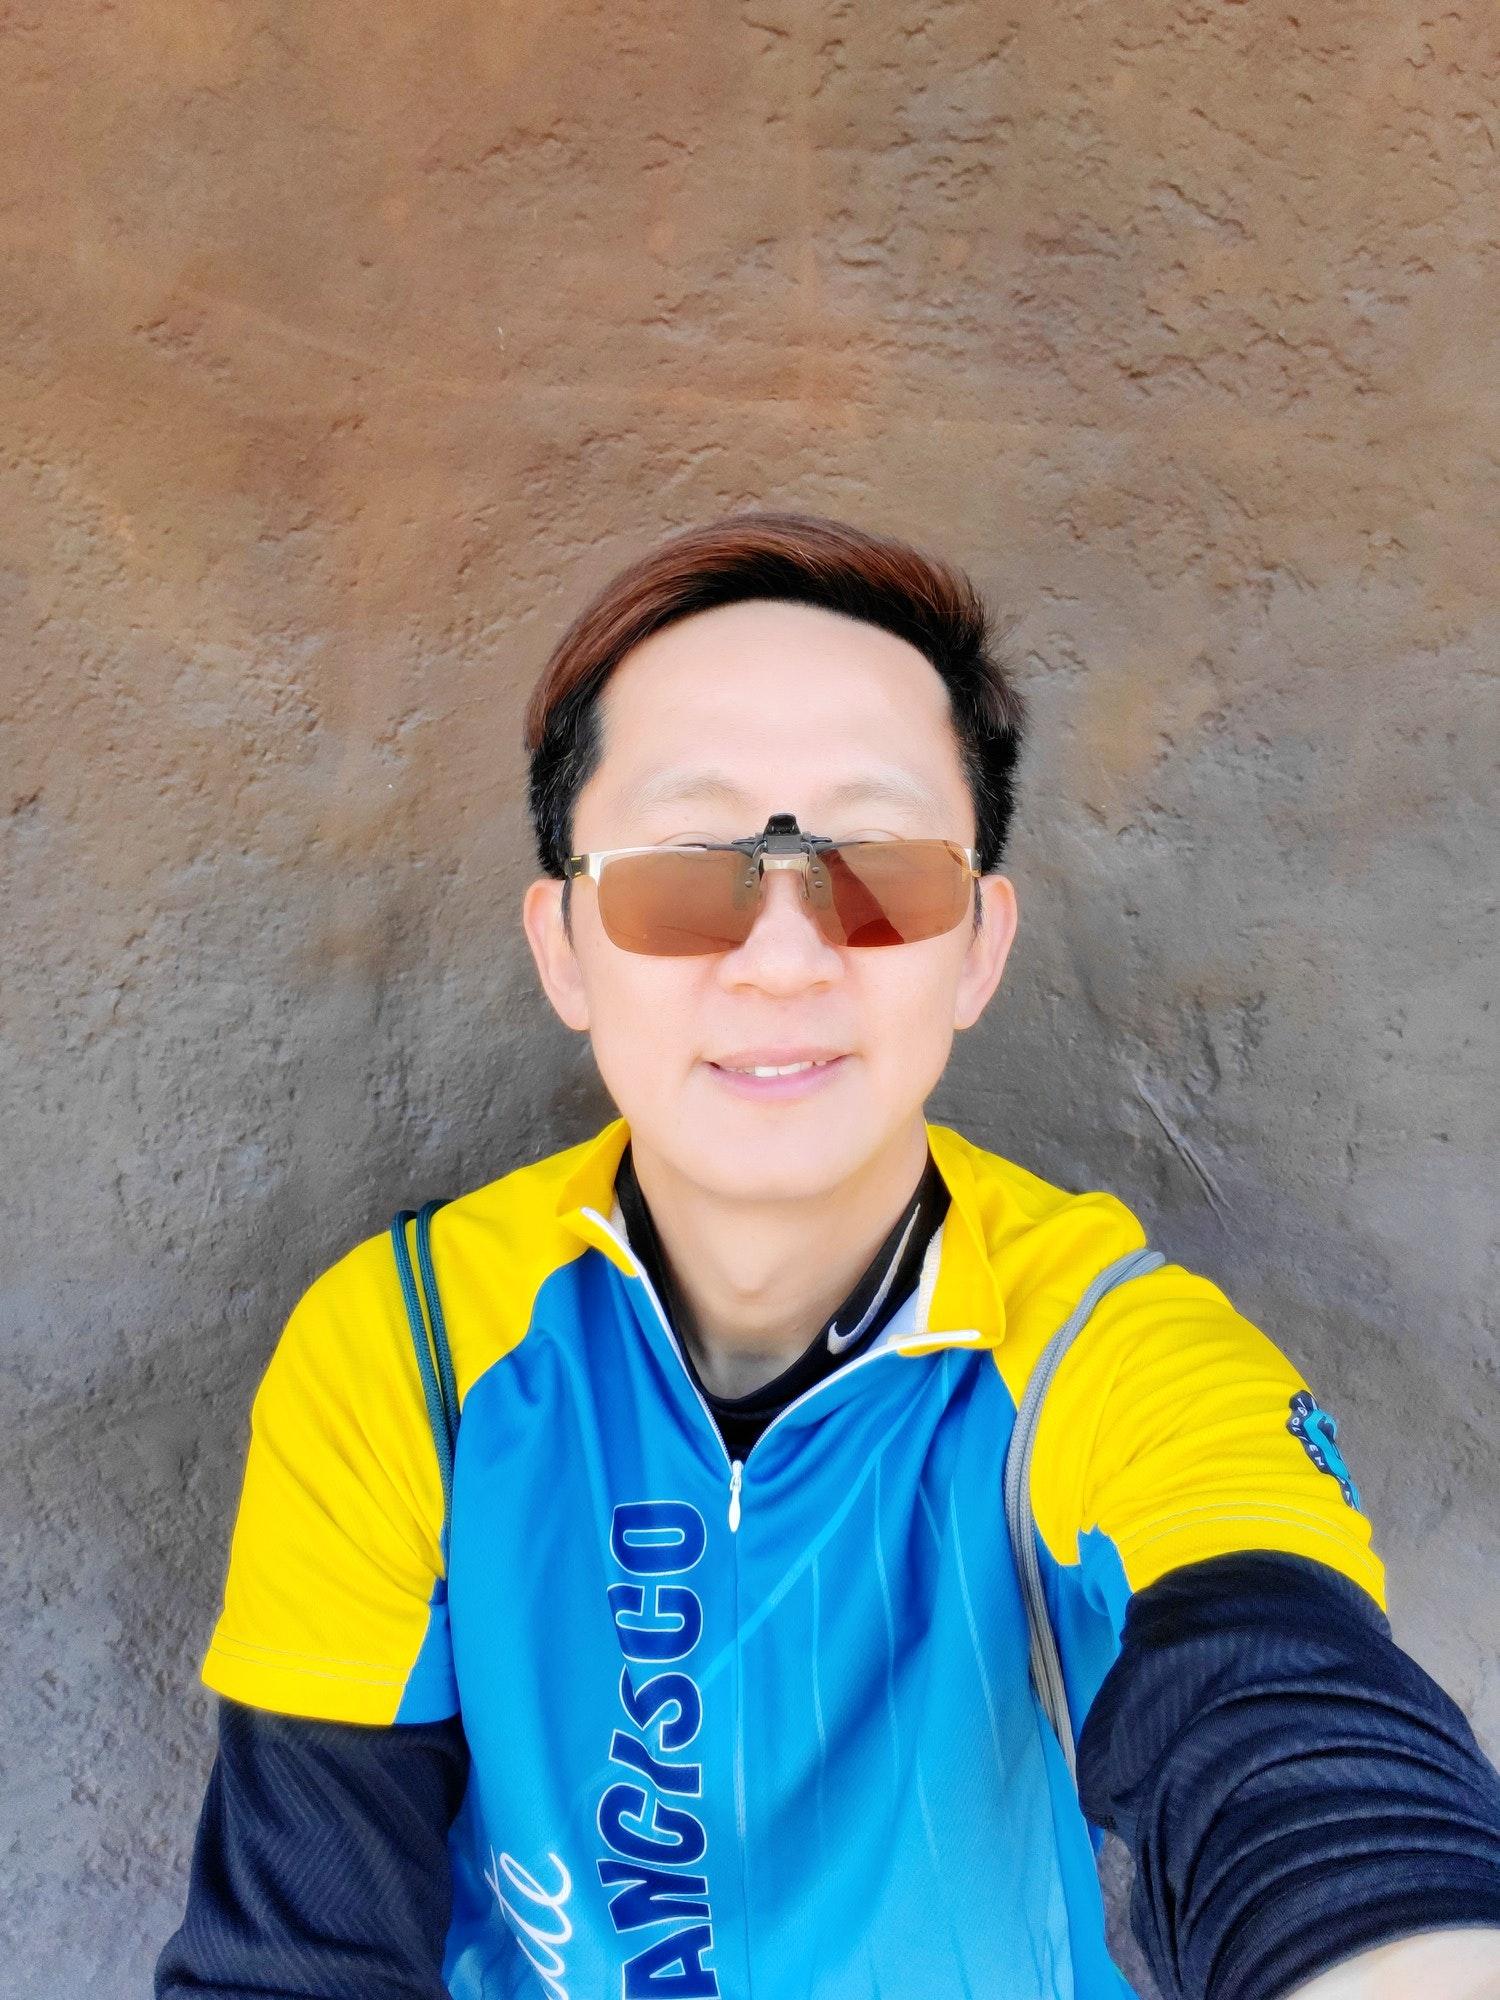 Wong S. teaches tennis lessons in Seatac, WA